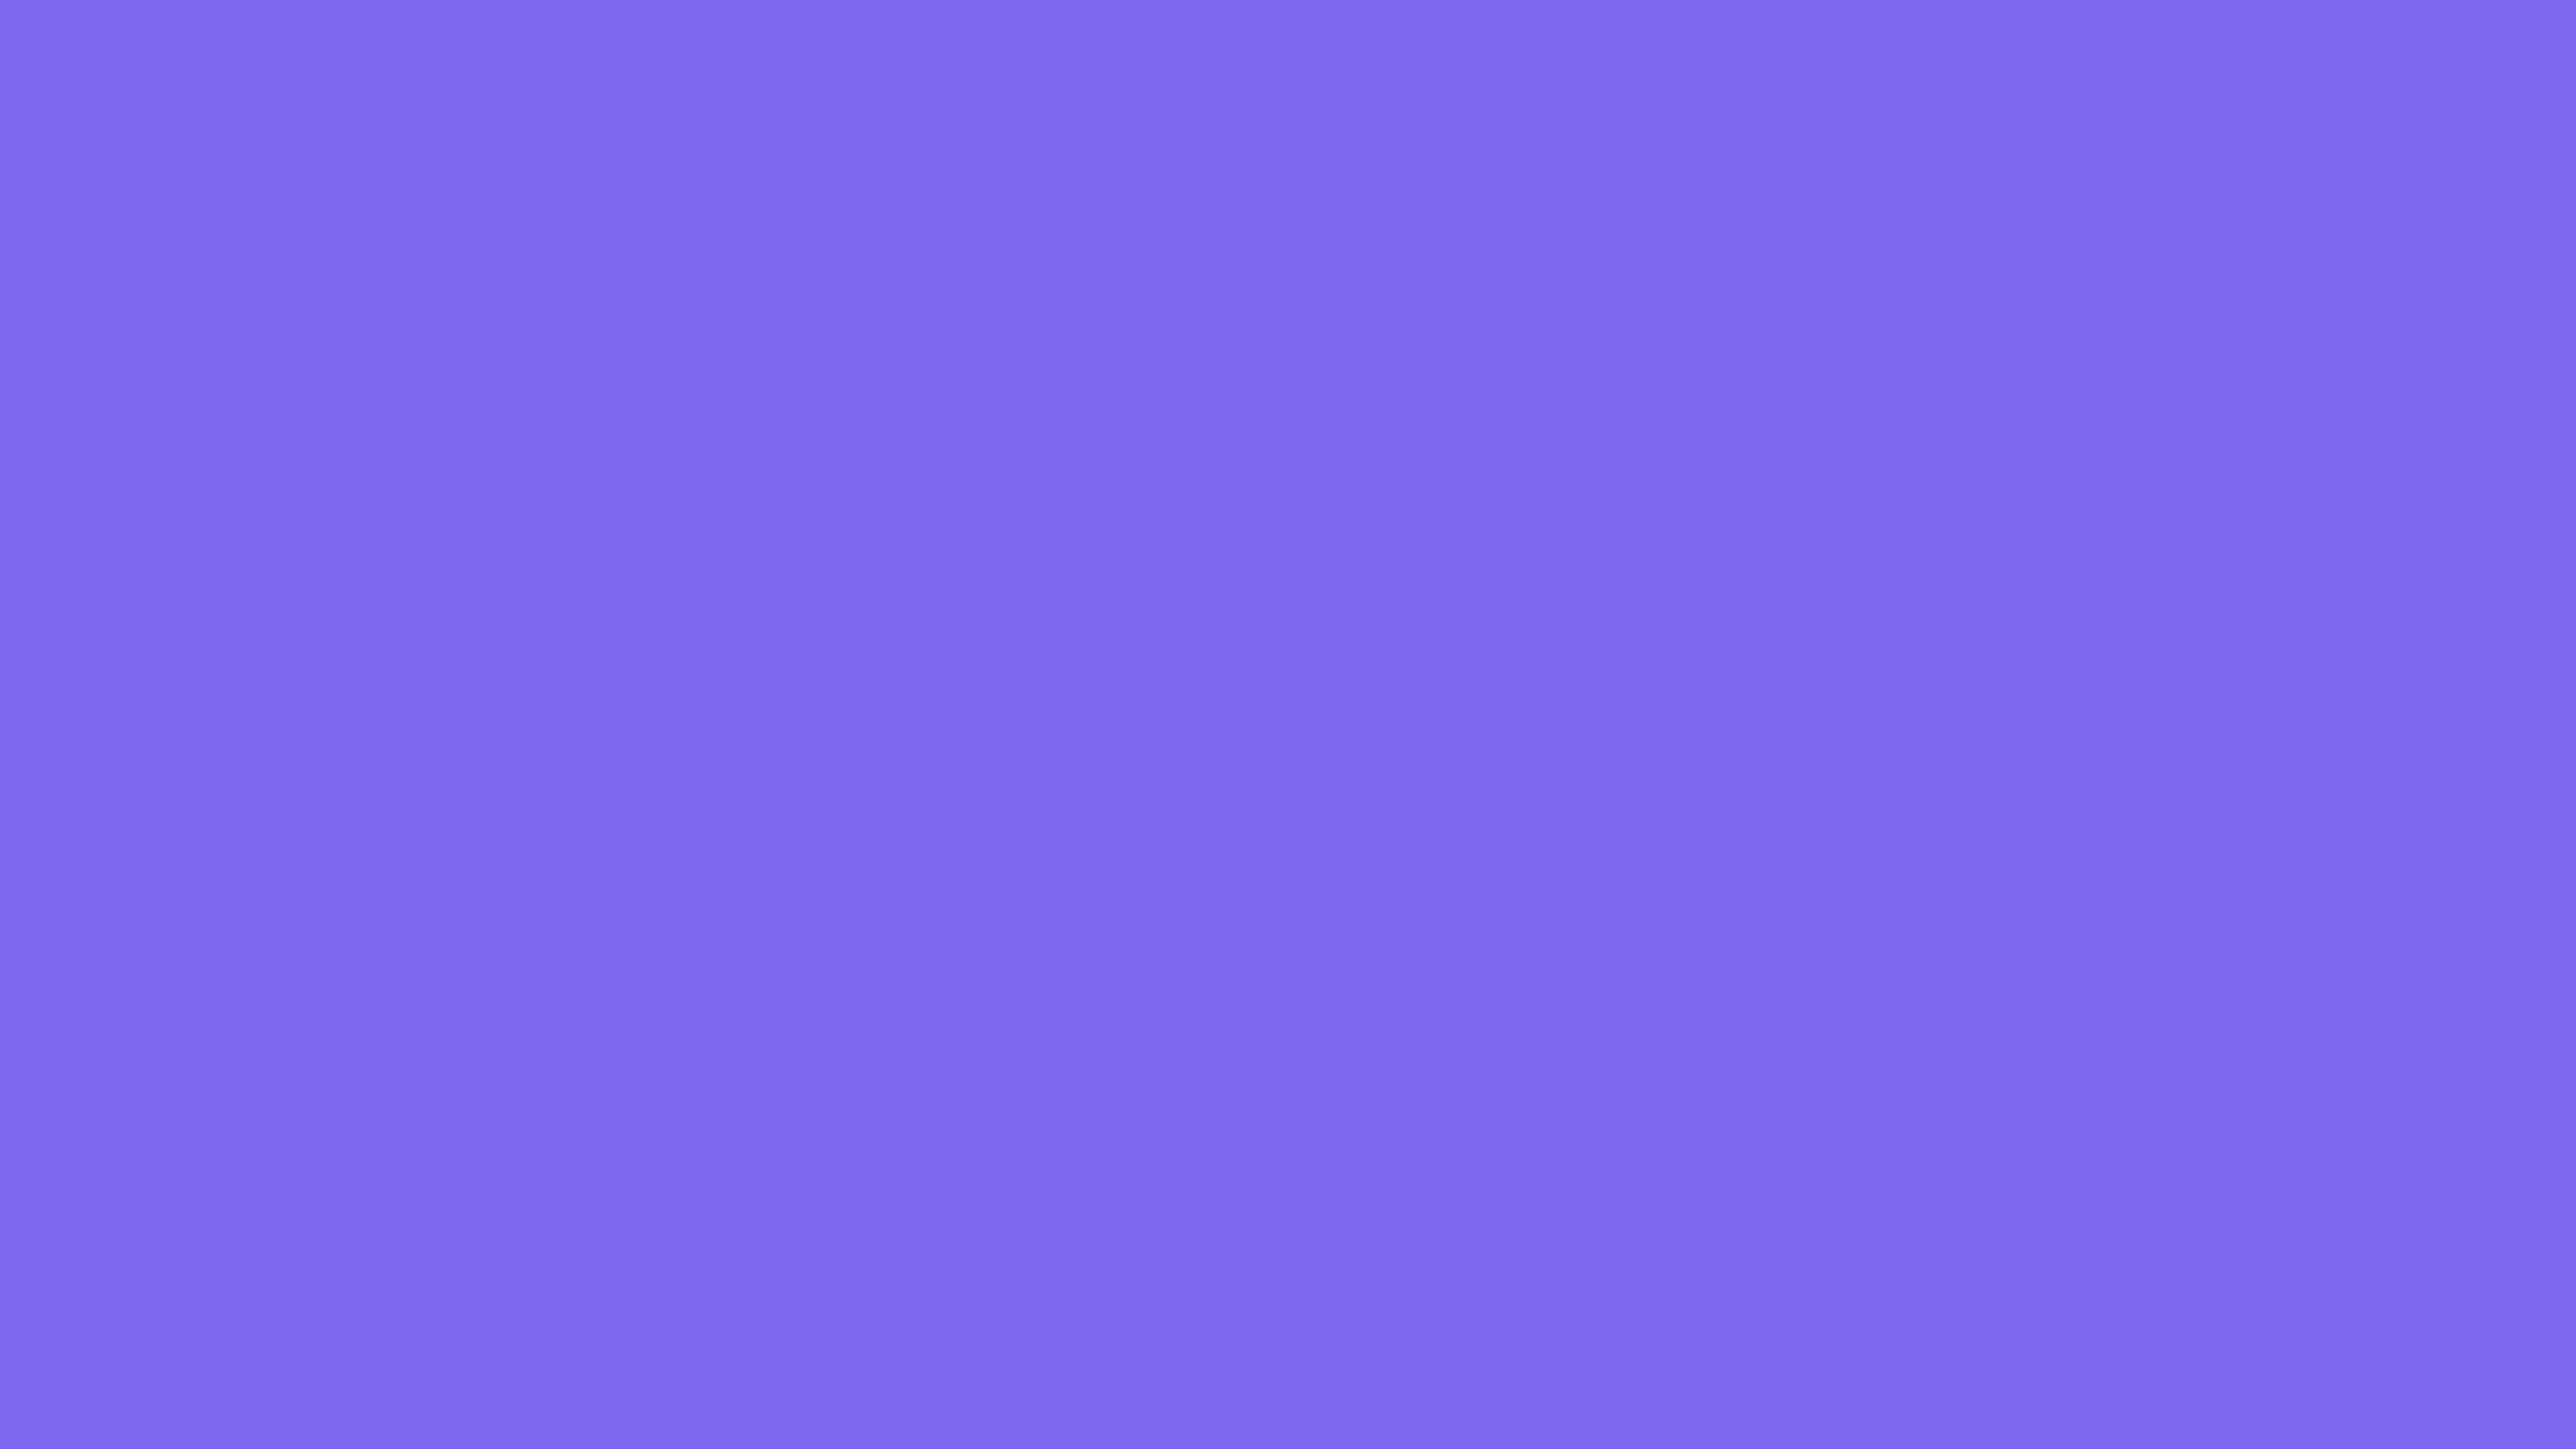 7680x4320 Medium Slate Blue Solid Color Background